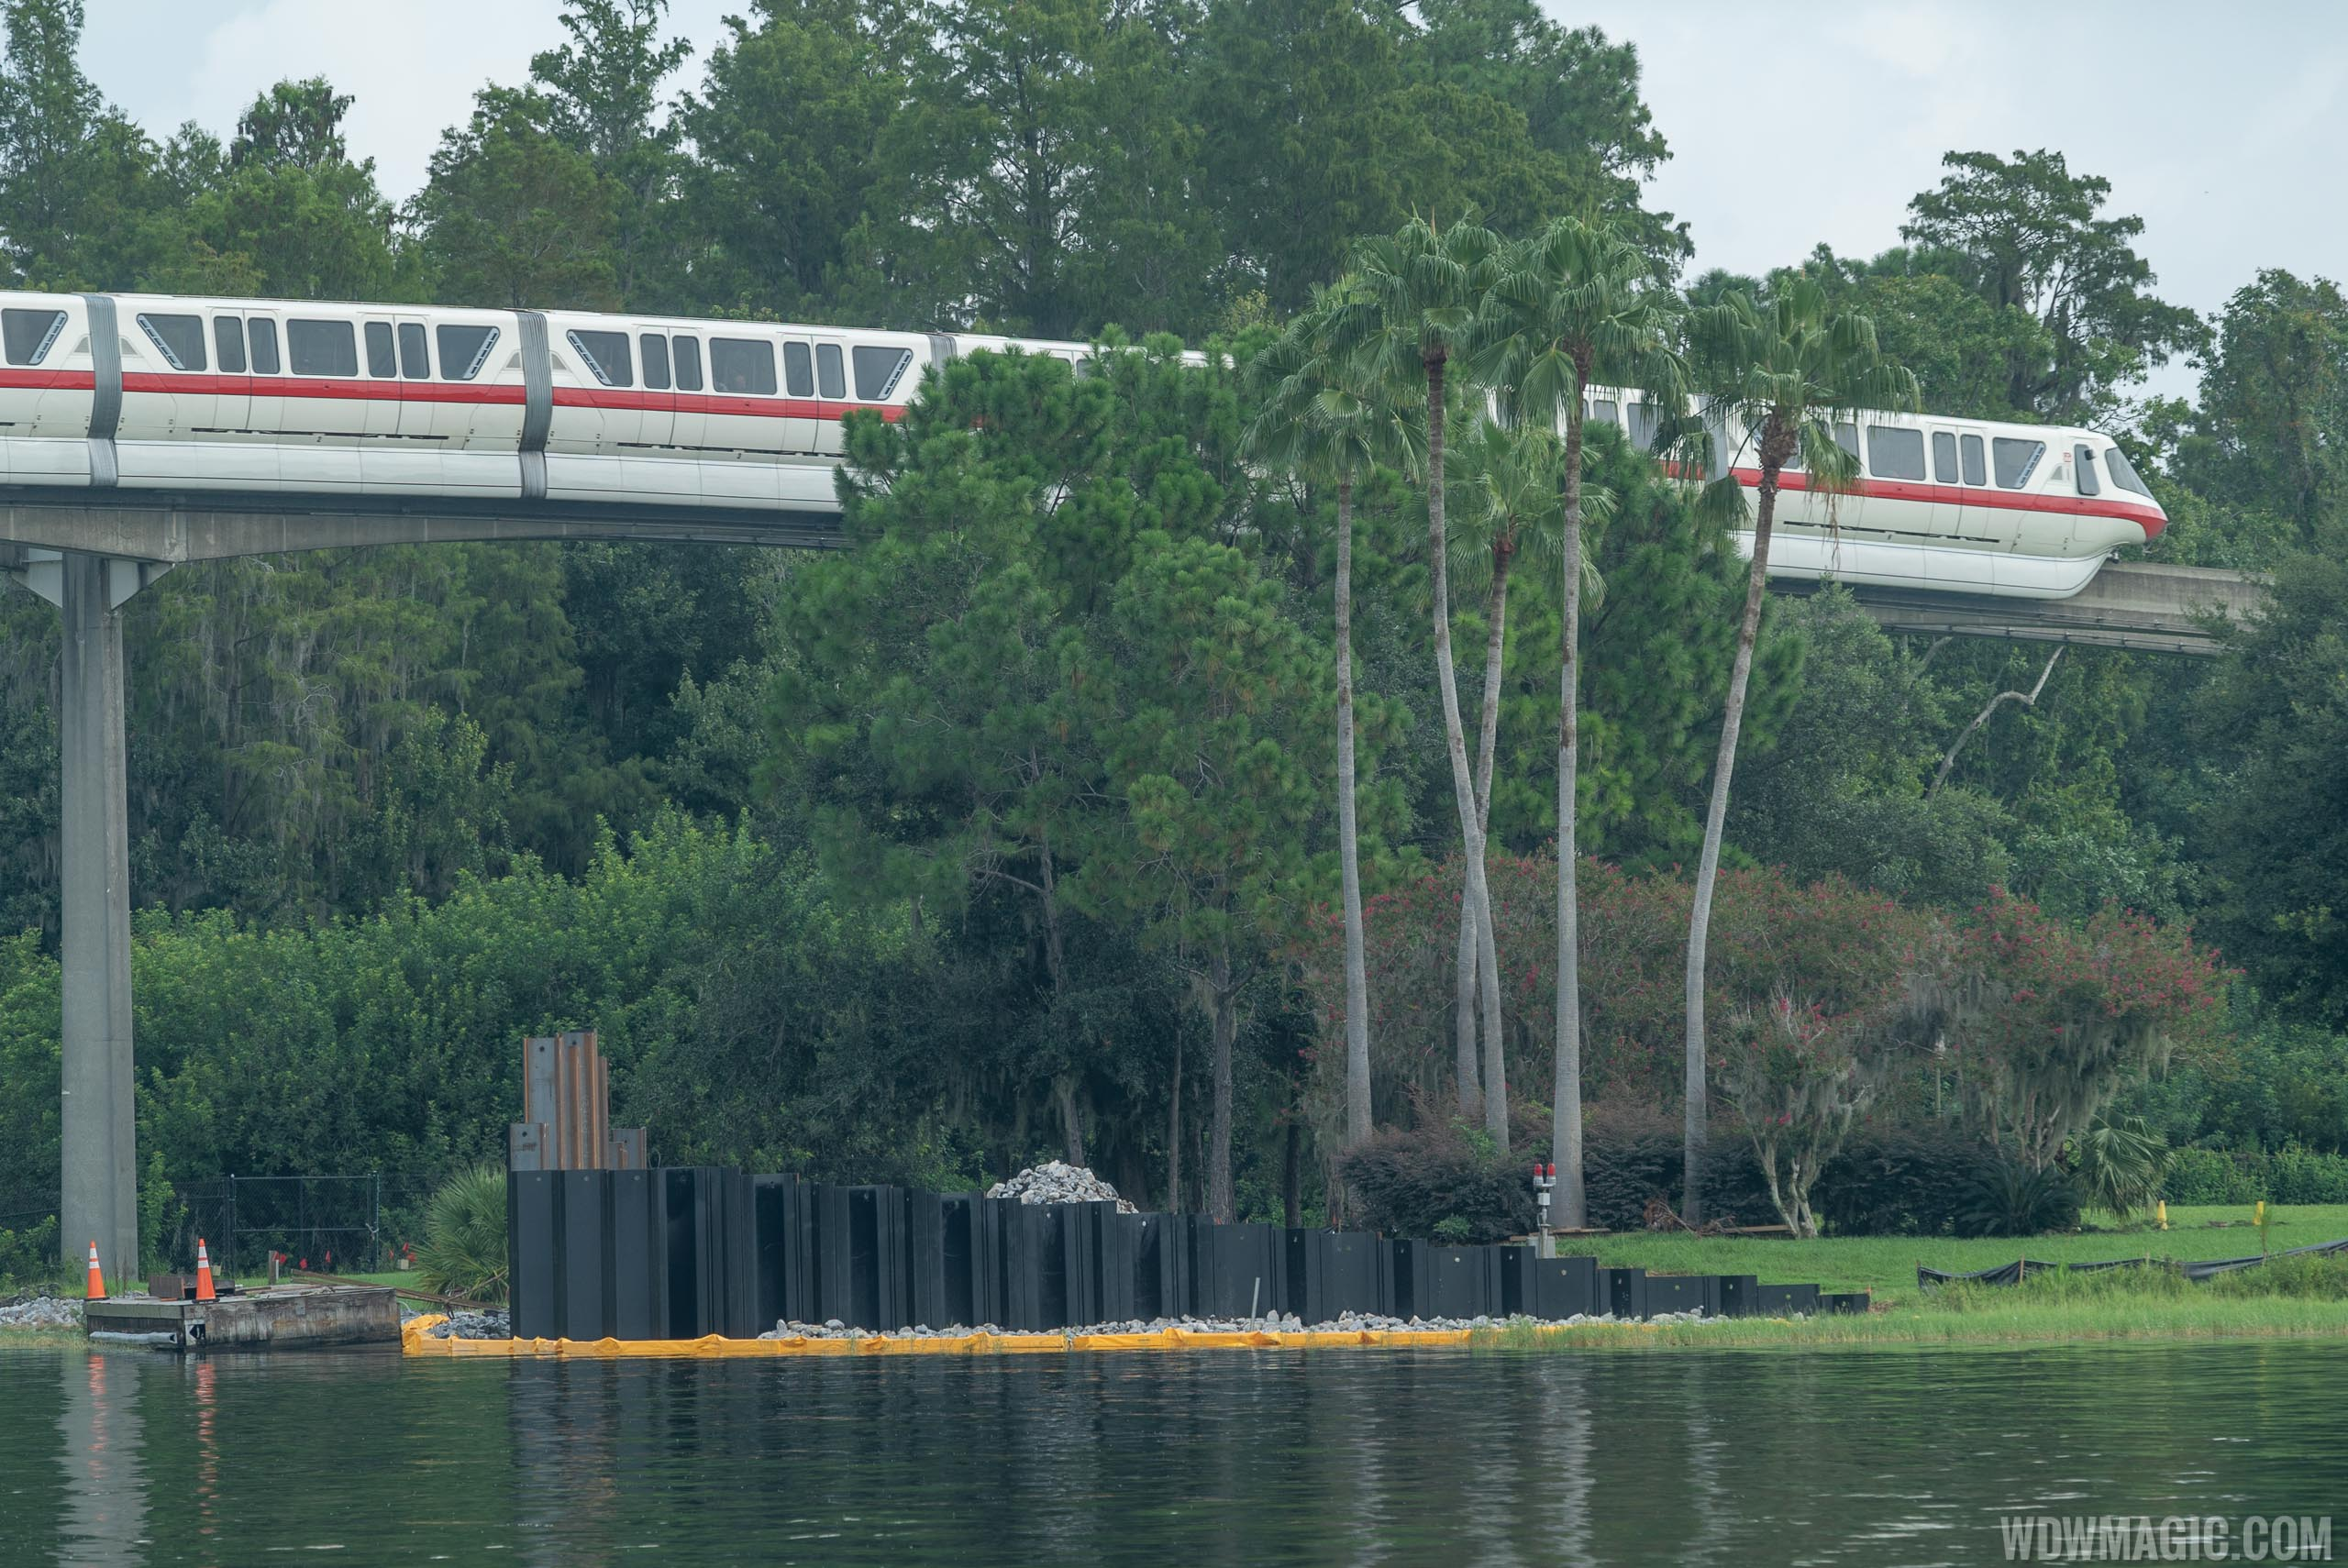 Grand Floridian to Magic Kingdom bridge construction - August 2019